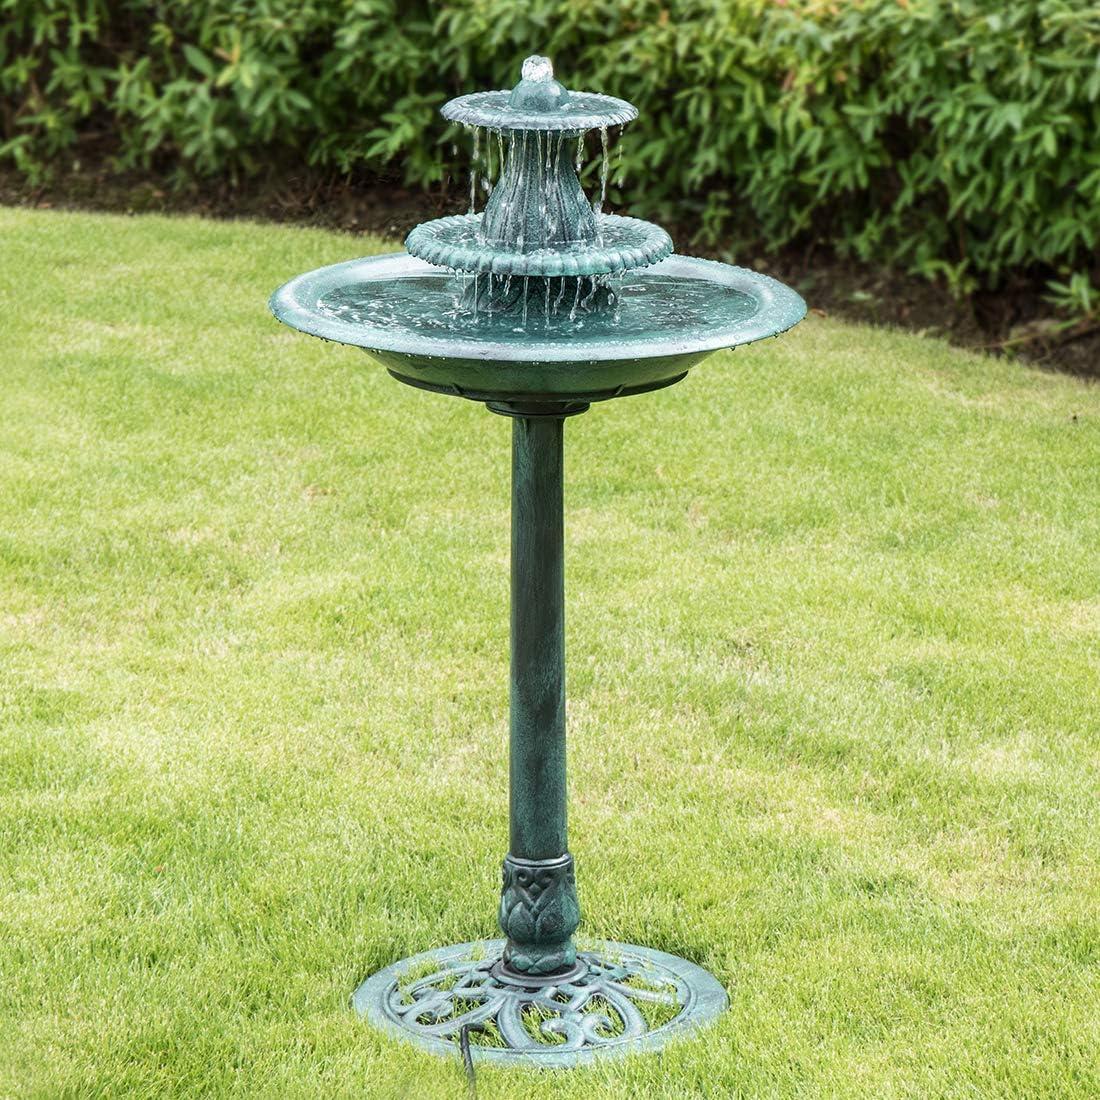 VIVOHOME 110V 40 Inch Height 3 Tiers Freestanding Electric Polyresin Lightweight Antique Outdoor Garden Bird Bath Water Fountain